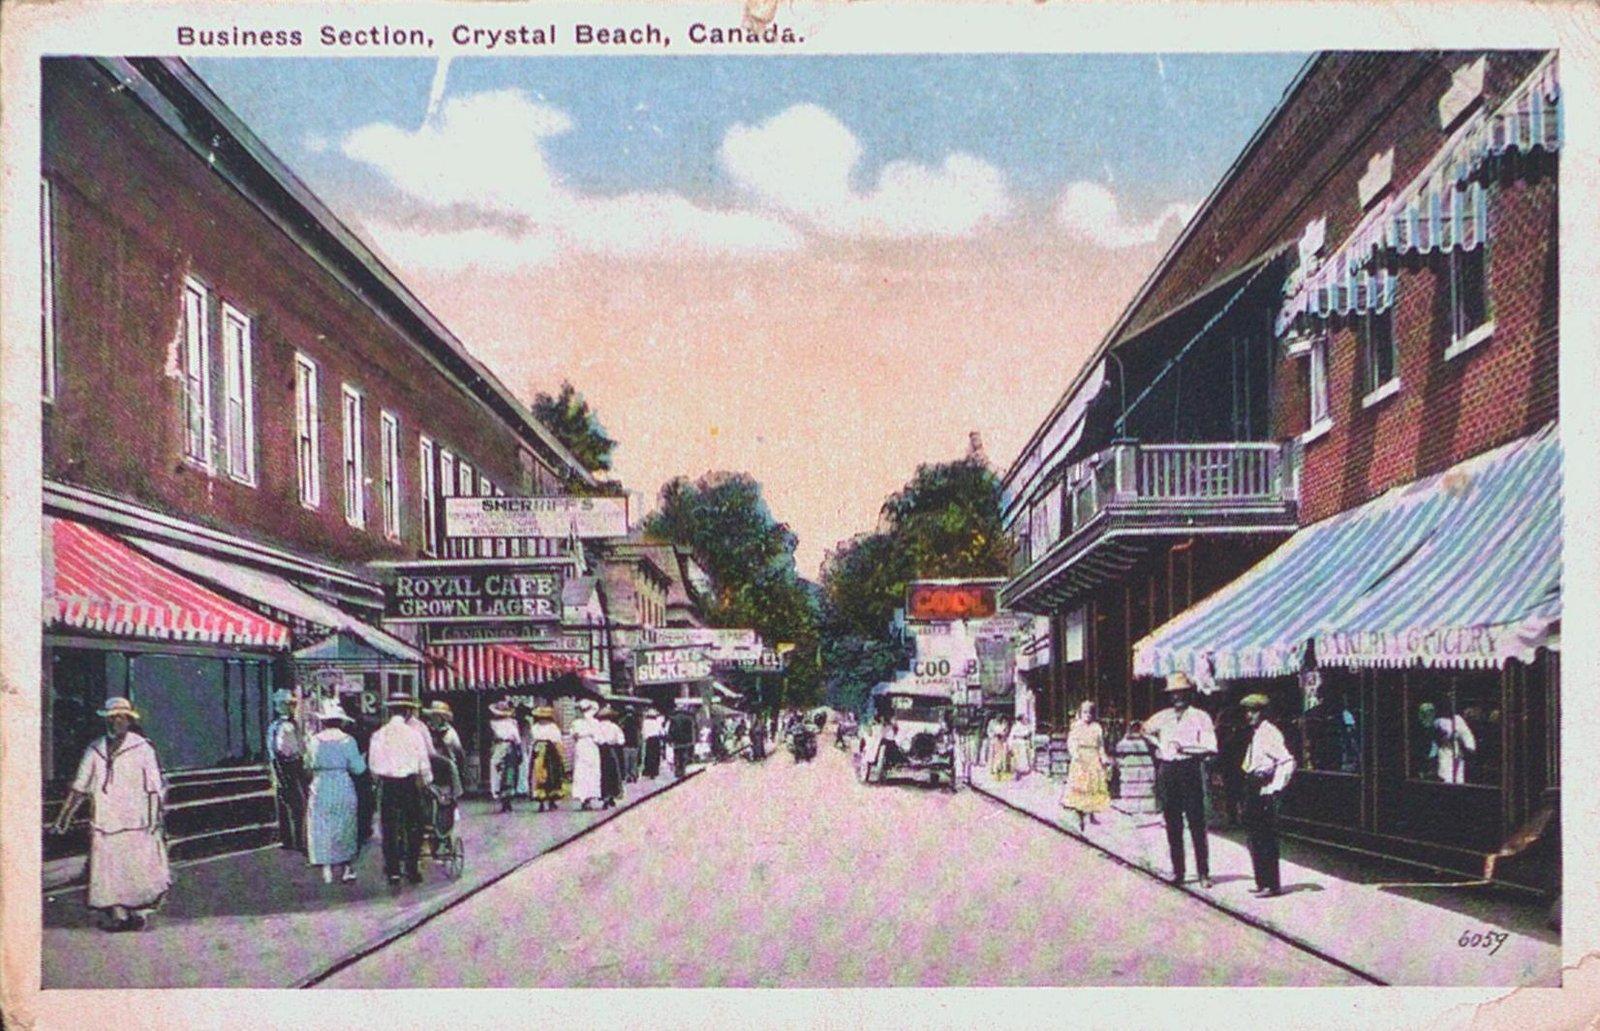 Business Section, Crystal Beach